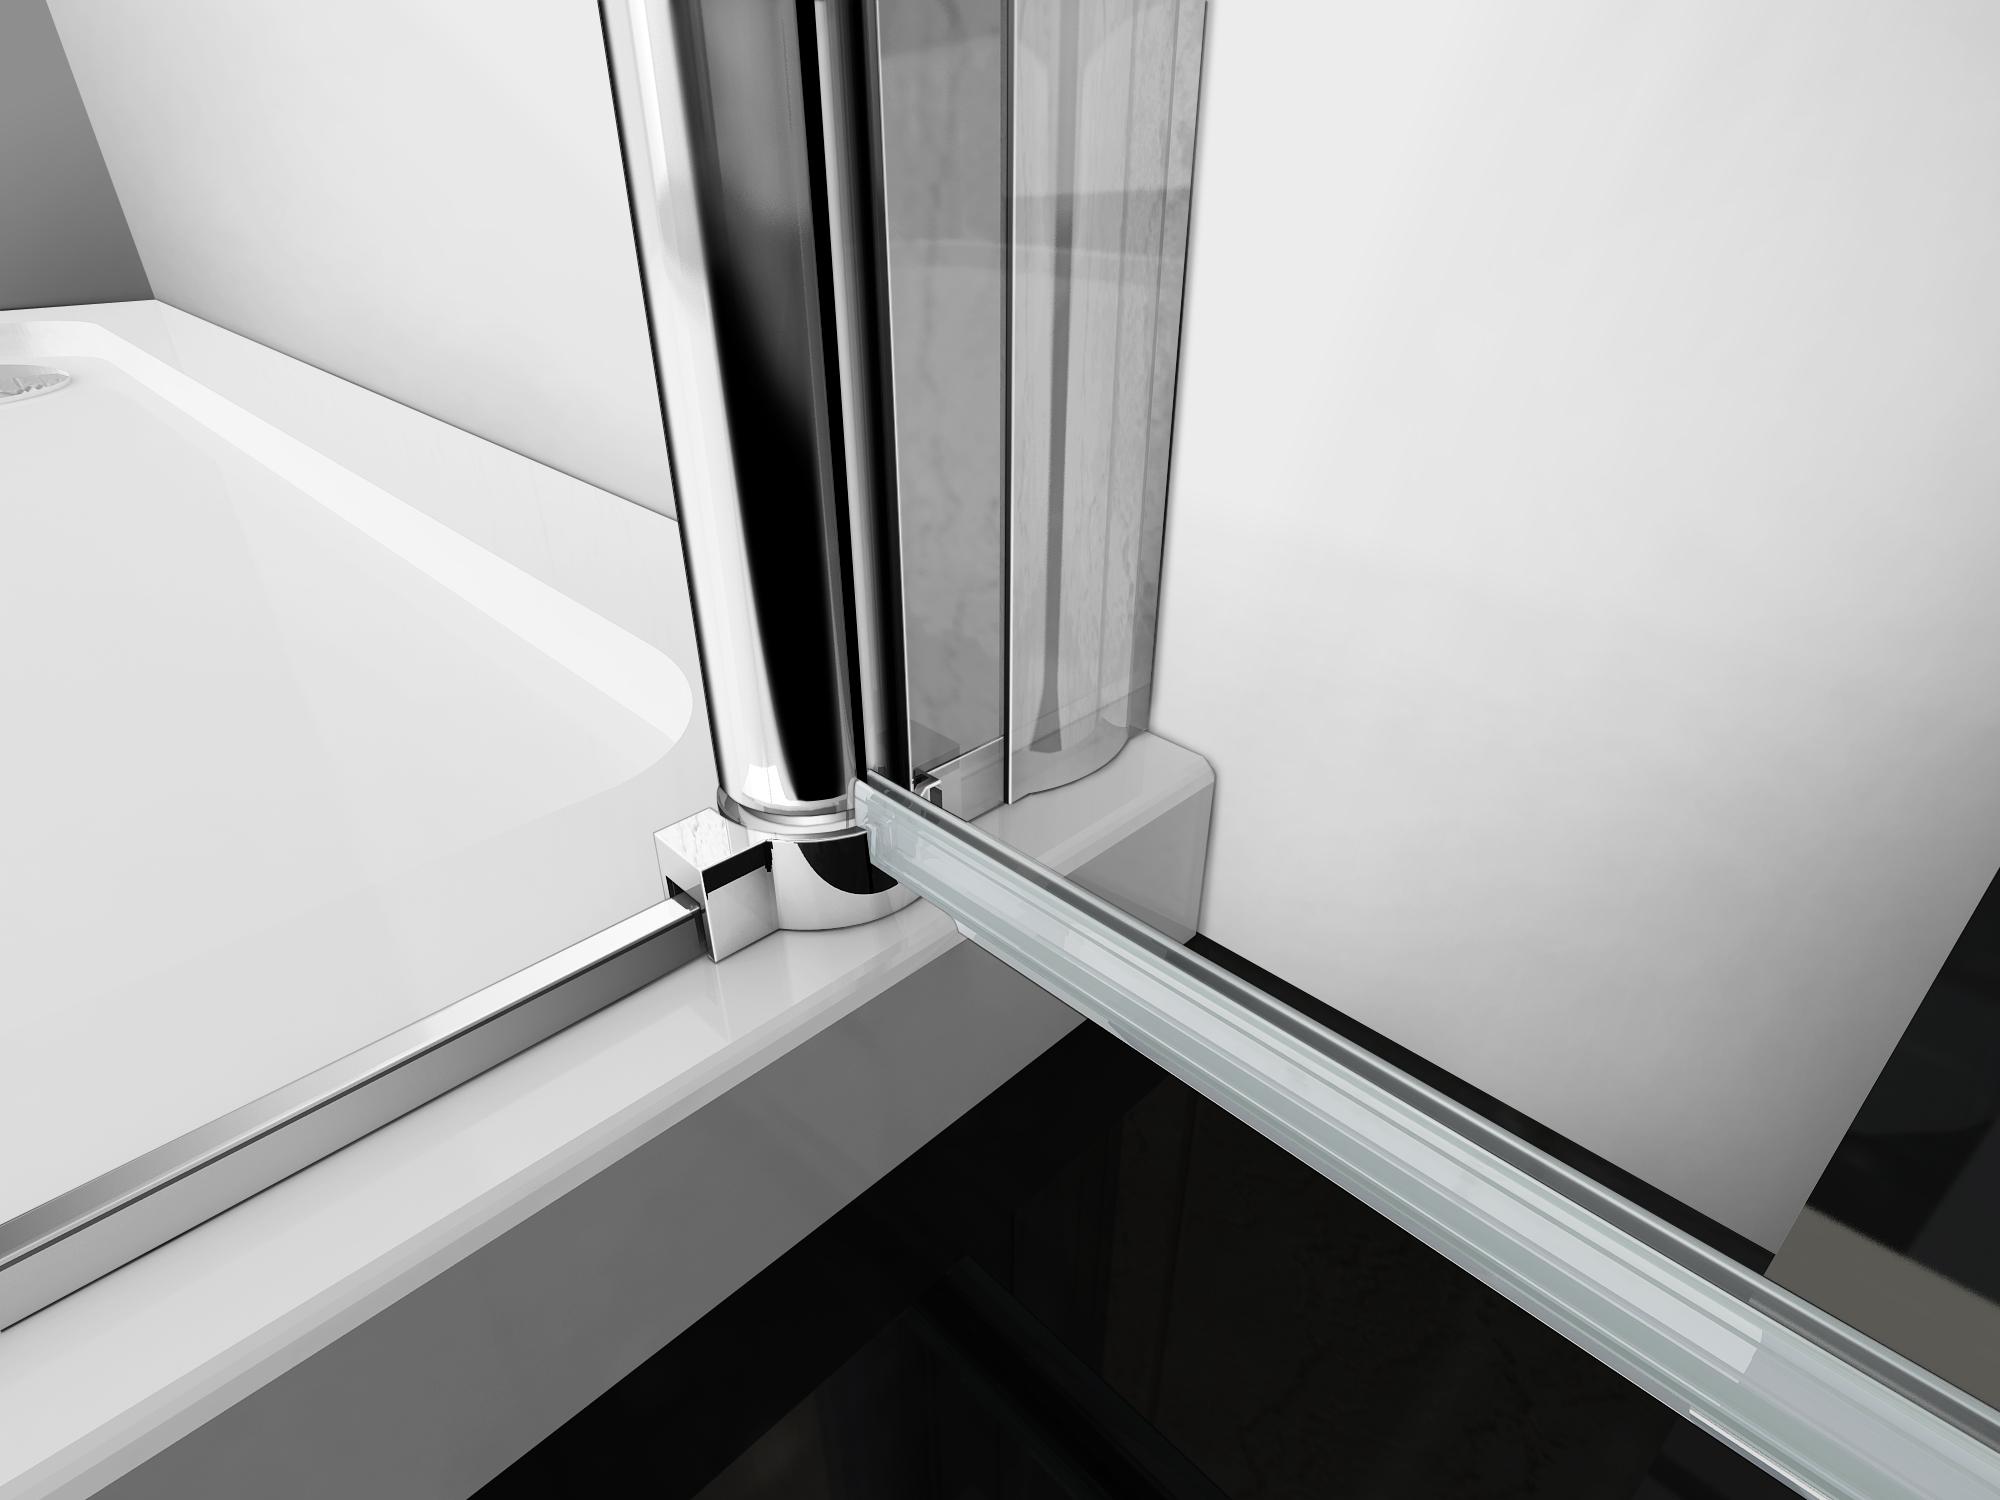 dusche nischent r schwingt r faltt r duschabtrennung duschwand echtglas 90cm ebay. Black Bedroom Furniture Sets. Home Design Ideas